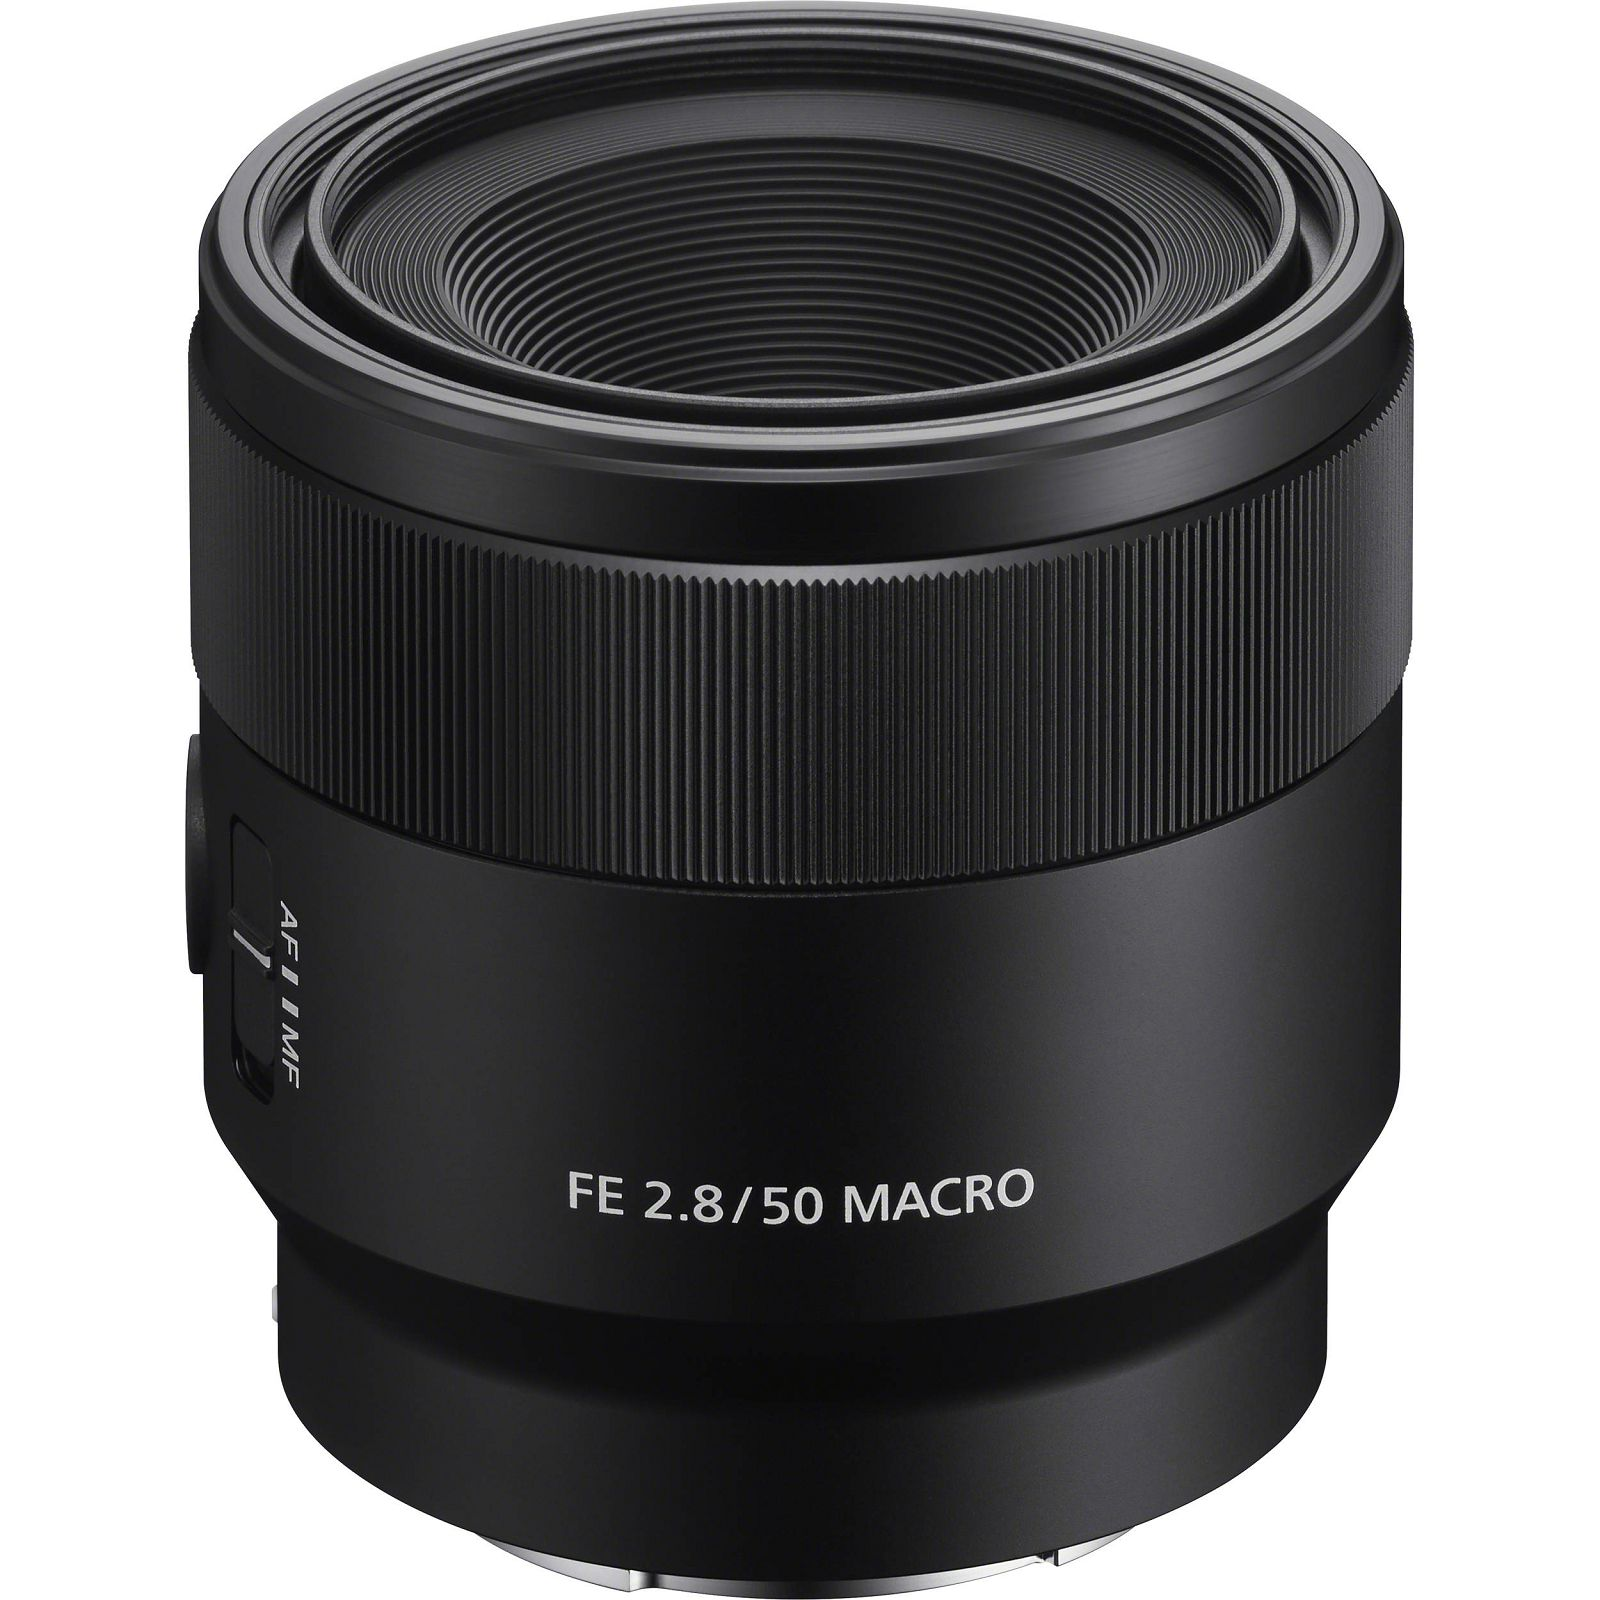 Sony FE 50mm f/2.8 Macro 1:1 standardni objektiv za E-Mount 50 F2.8 2.8 f/2,8 SEL-50M28 SEL50M28 (SEL50M28.SYX) - Cash Back